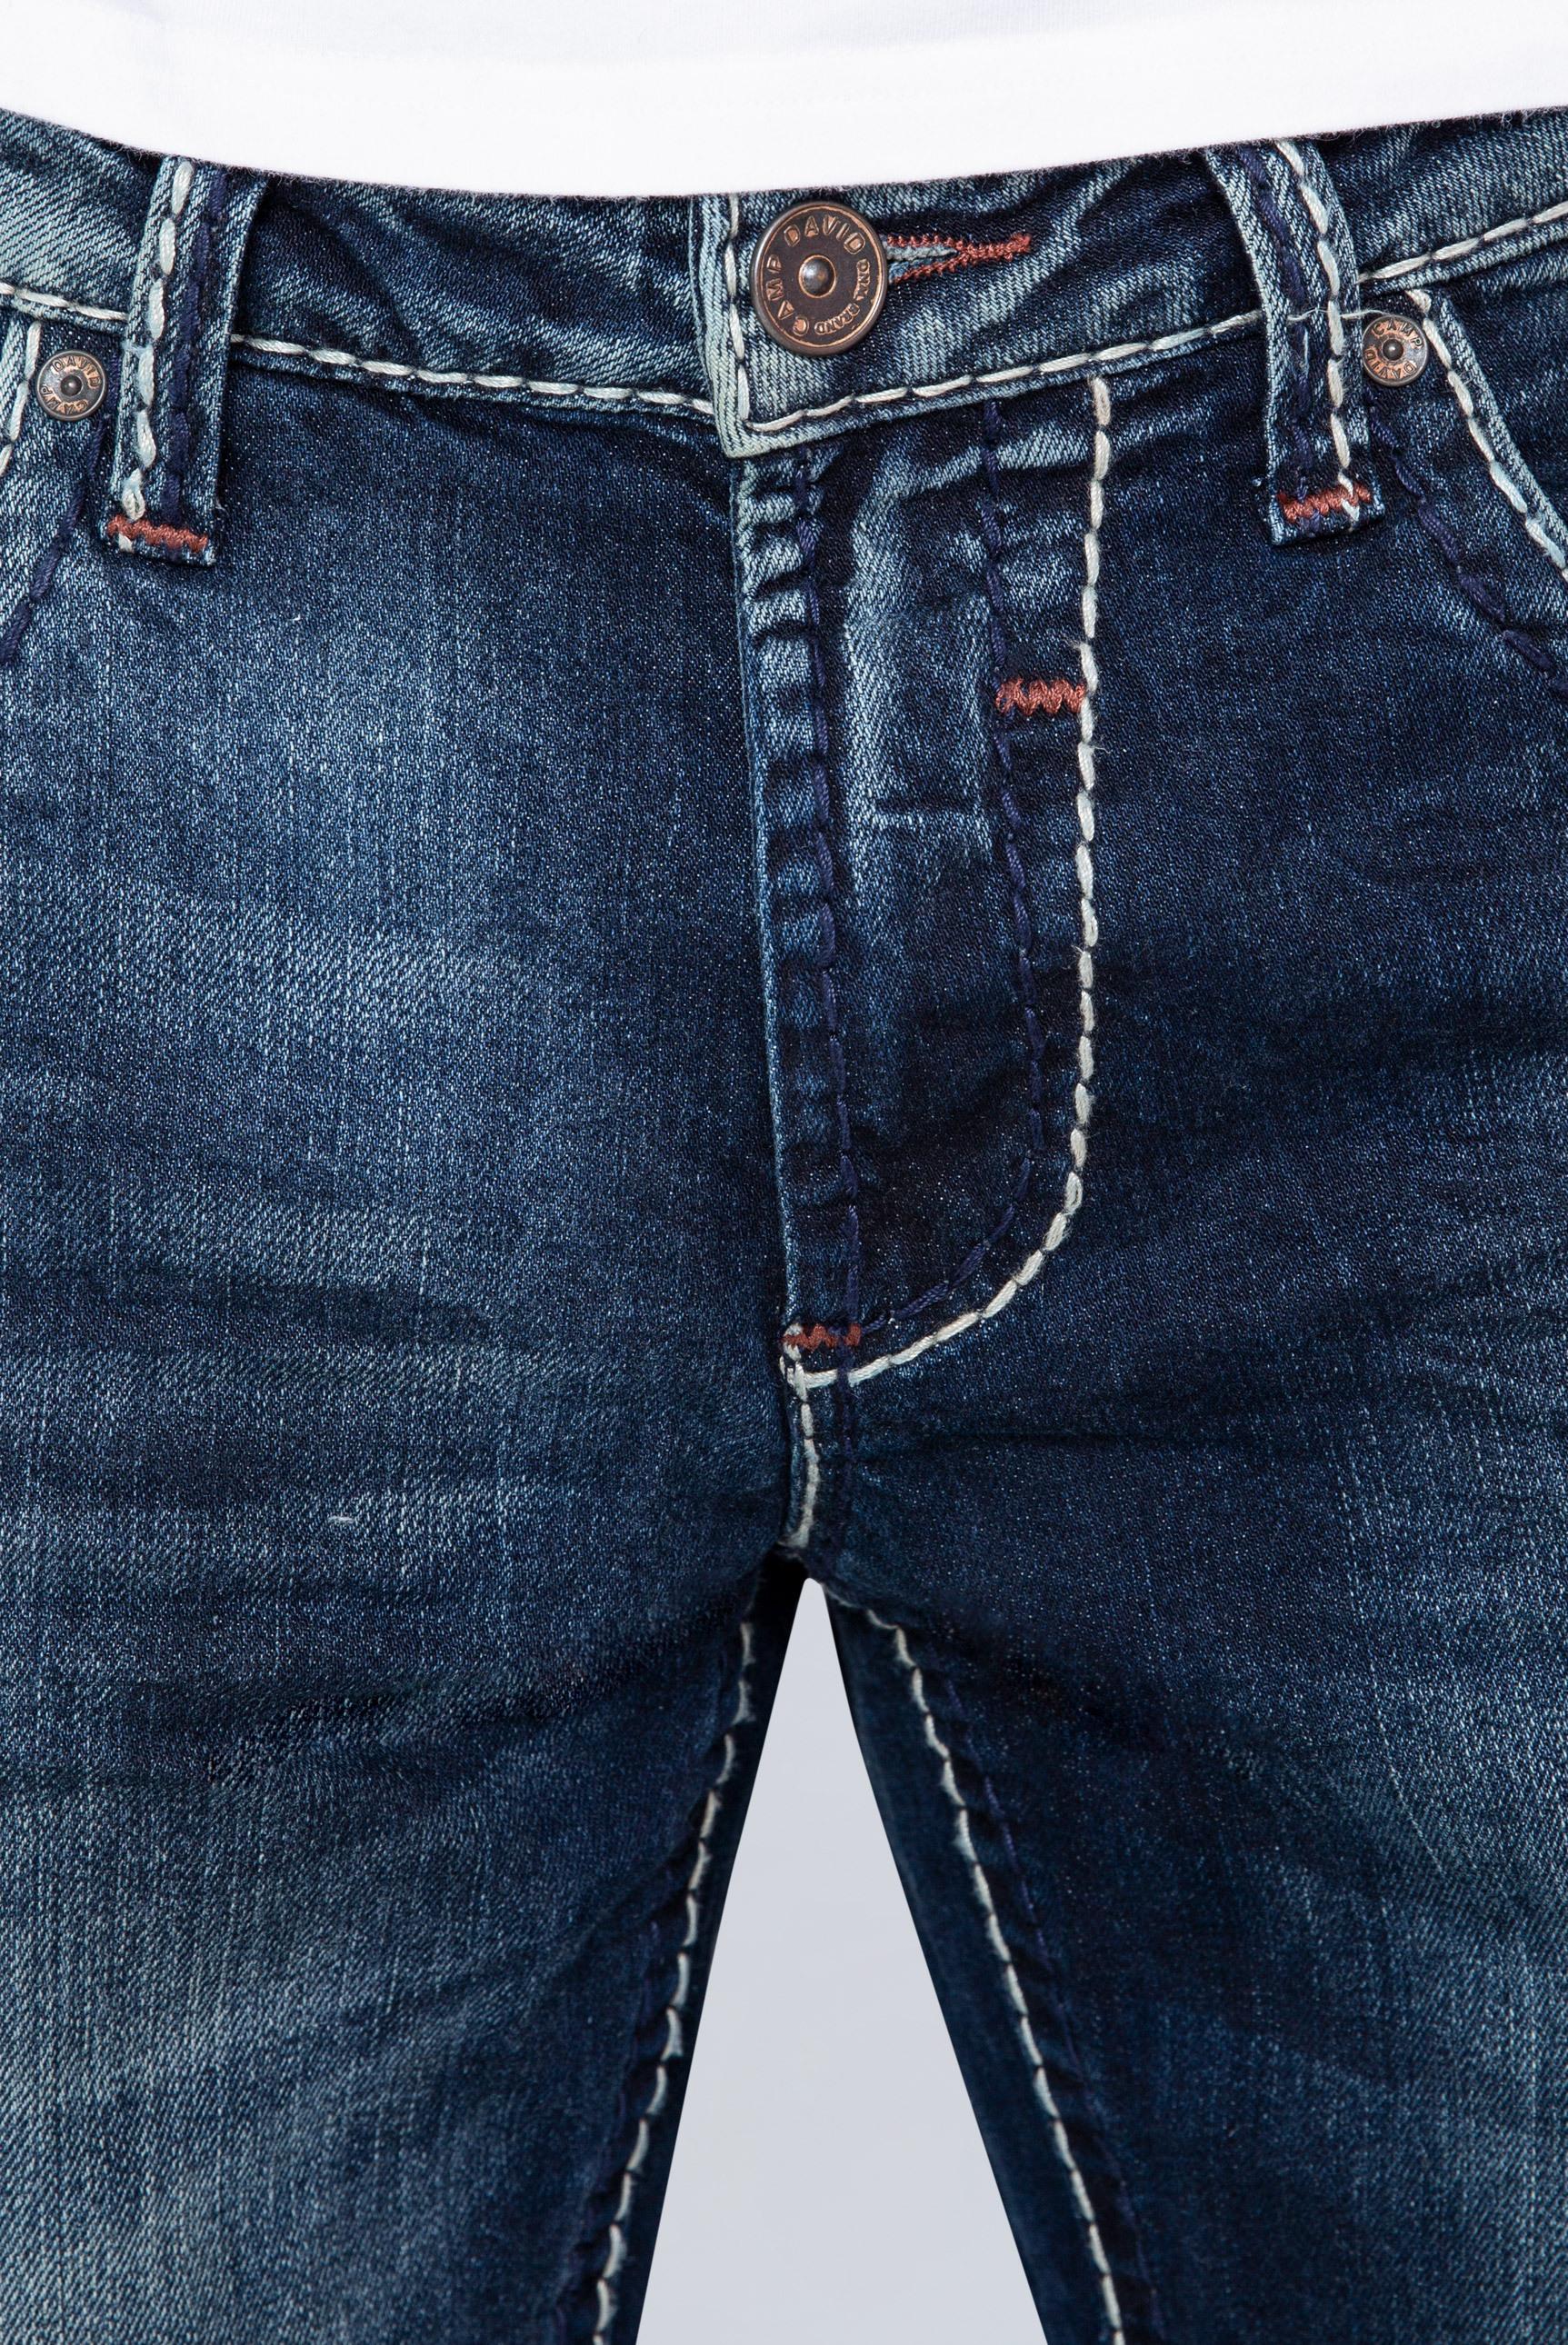 Regular Fit Jeans NI:CO, Dark Used